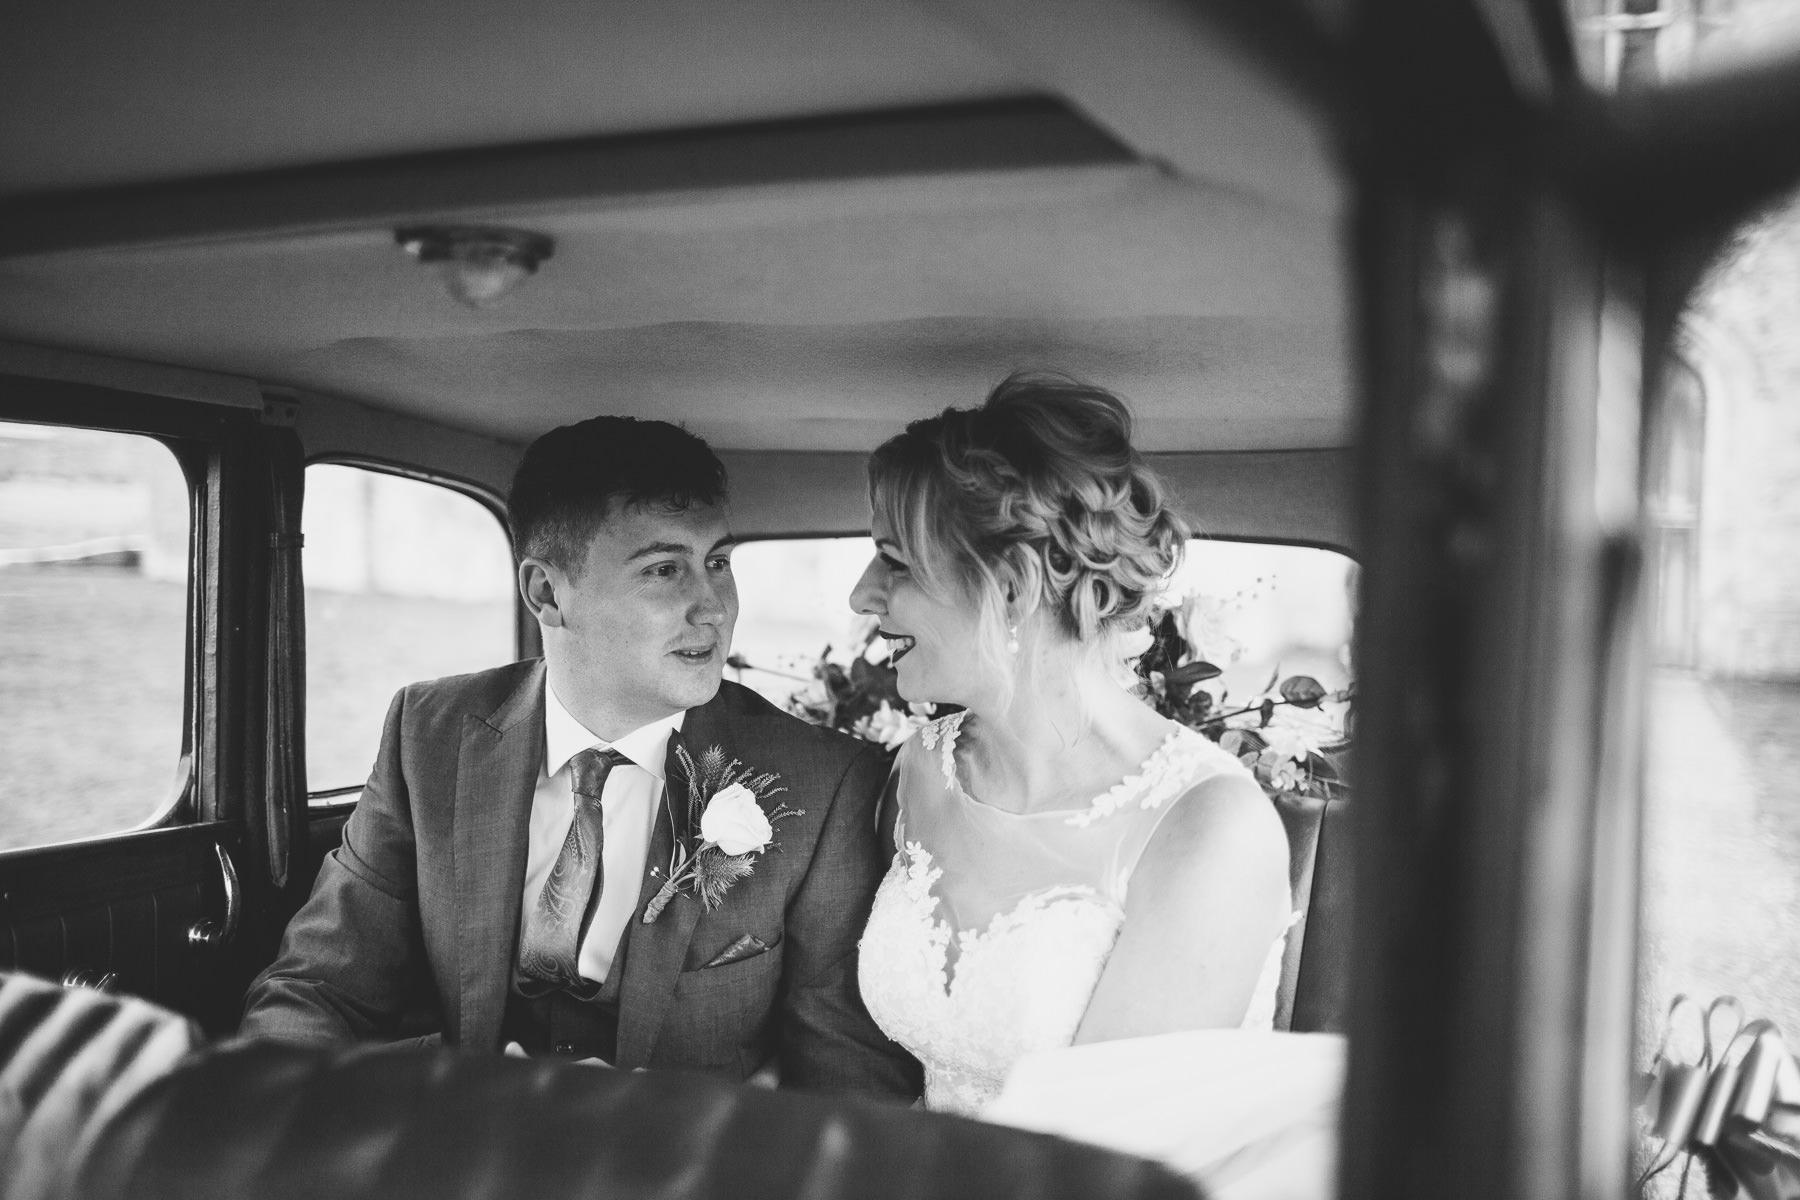 Titchfield-abbey-fareham-registry-wedding-photography-Jessica-and-Lance-web-139